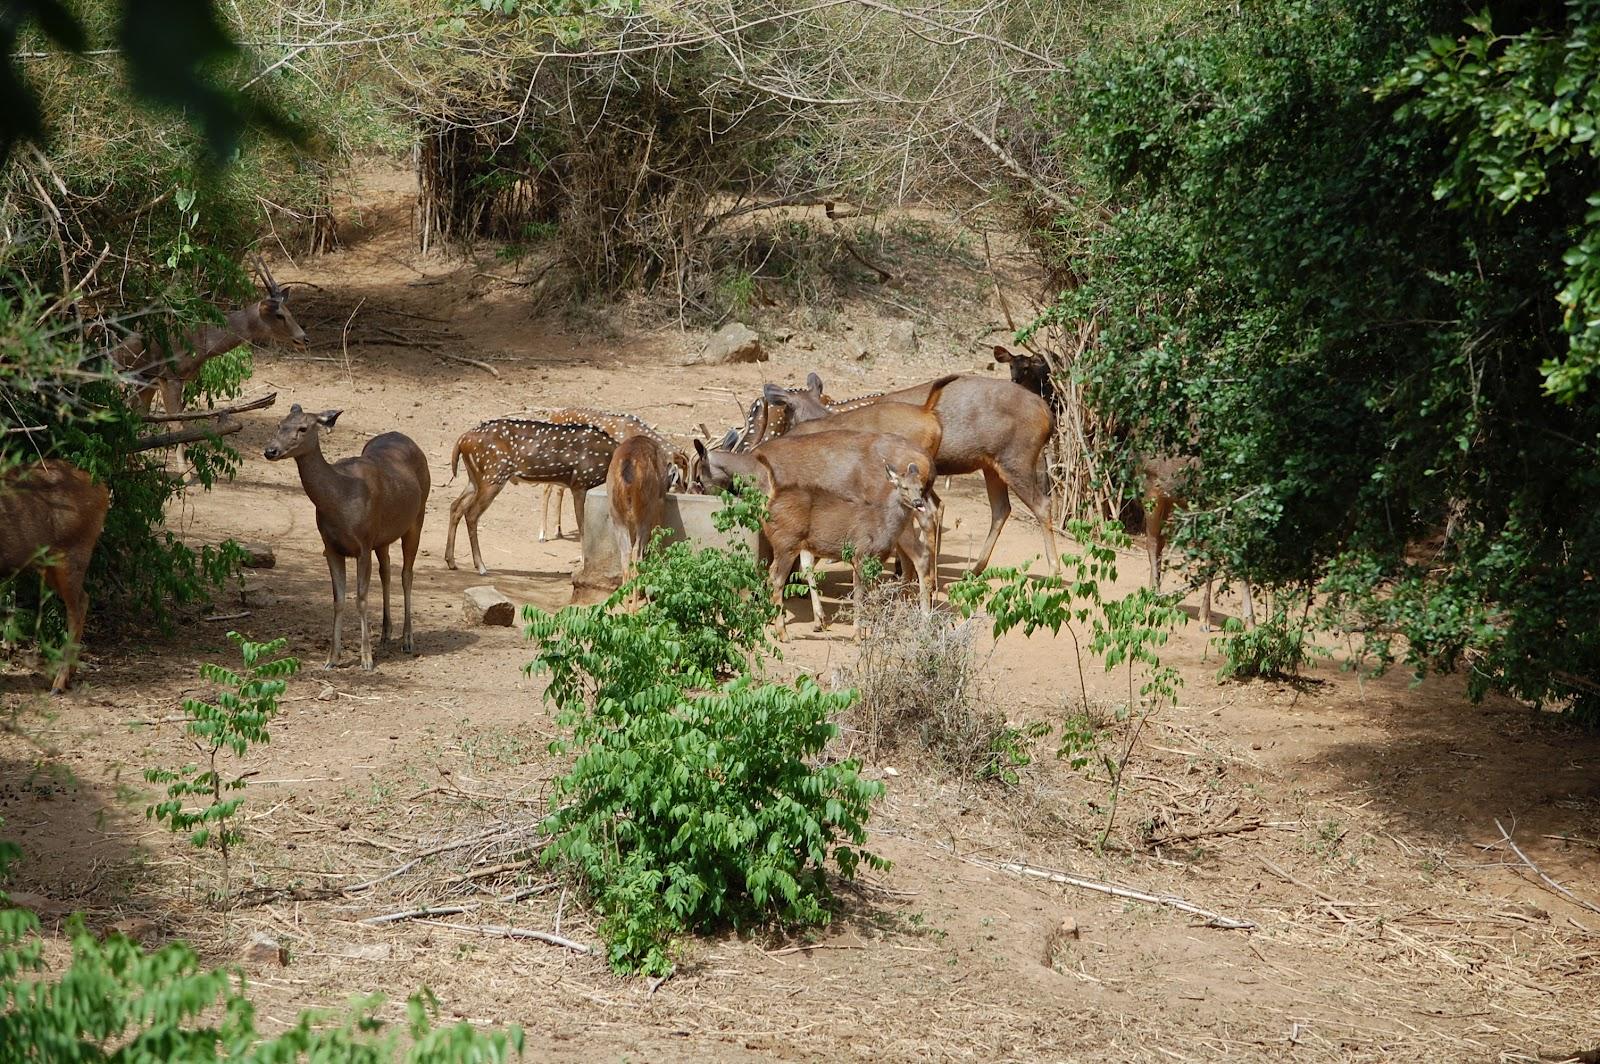 bannerghatta national park information